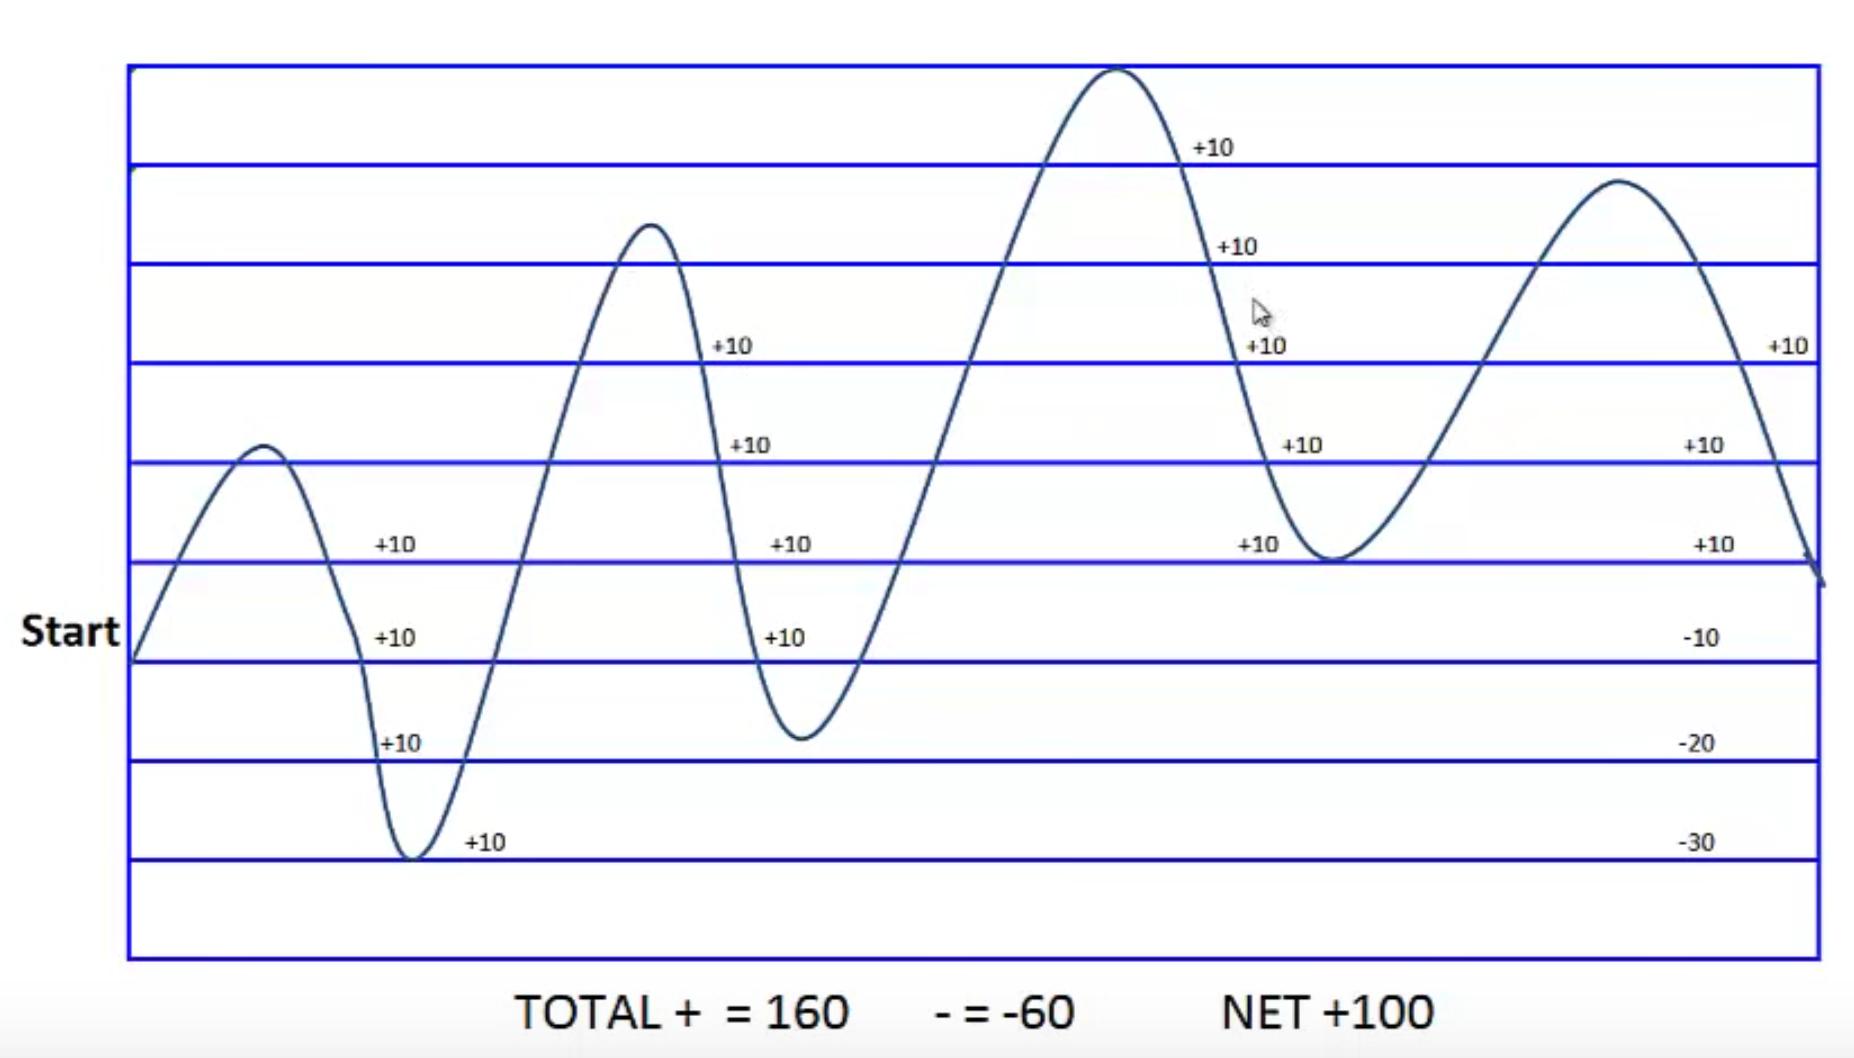 Forex grid ea prekybos sistema v3.0, yra aspektų,...